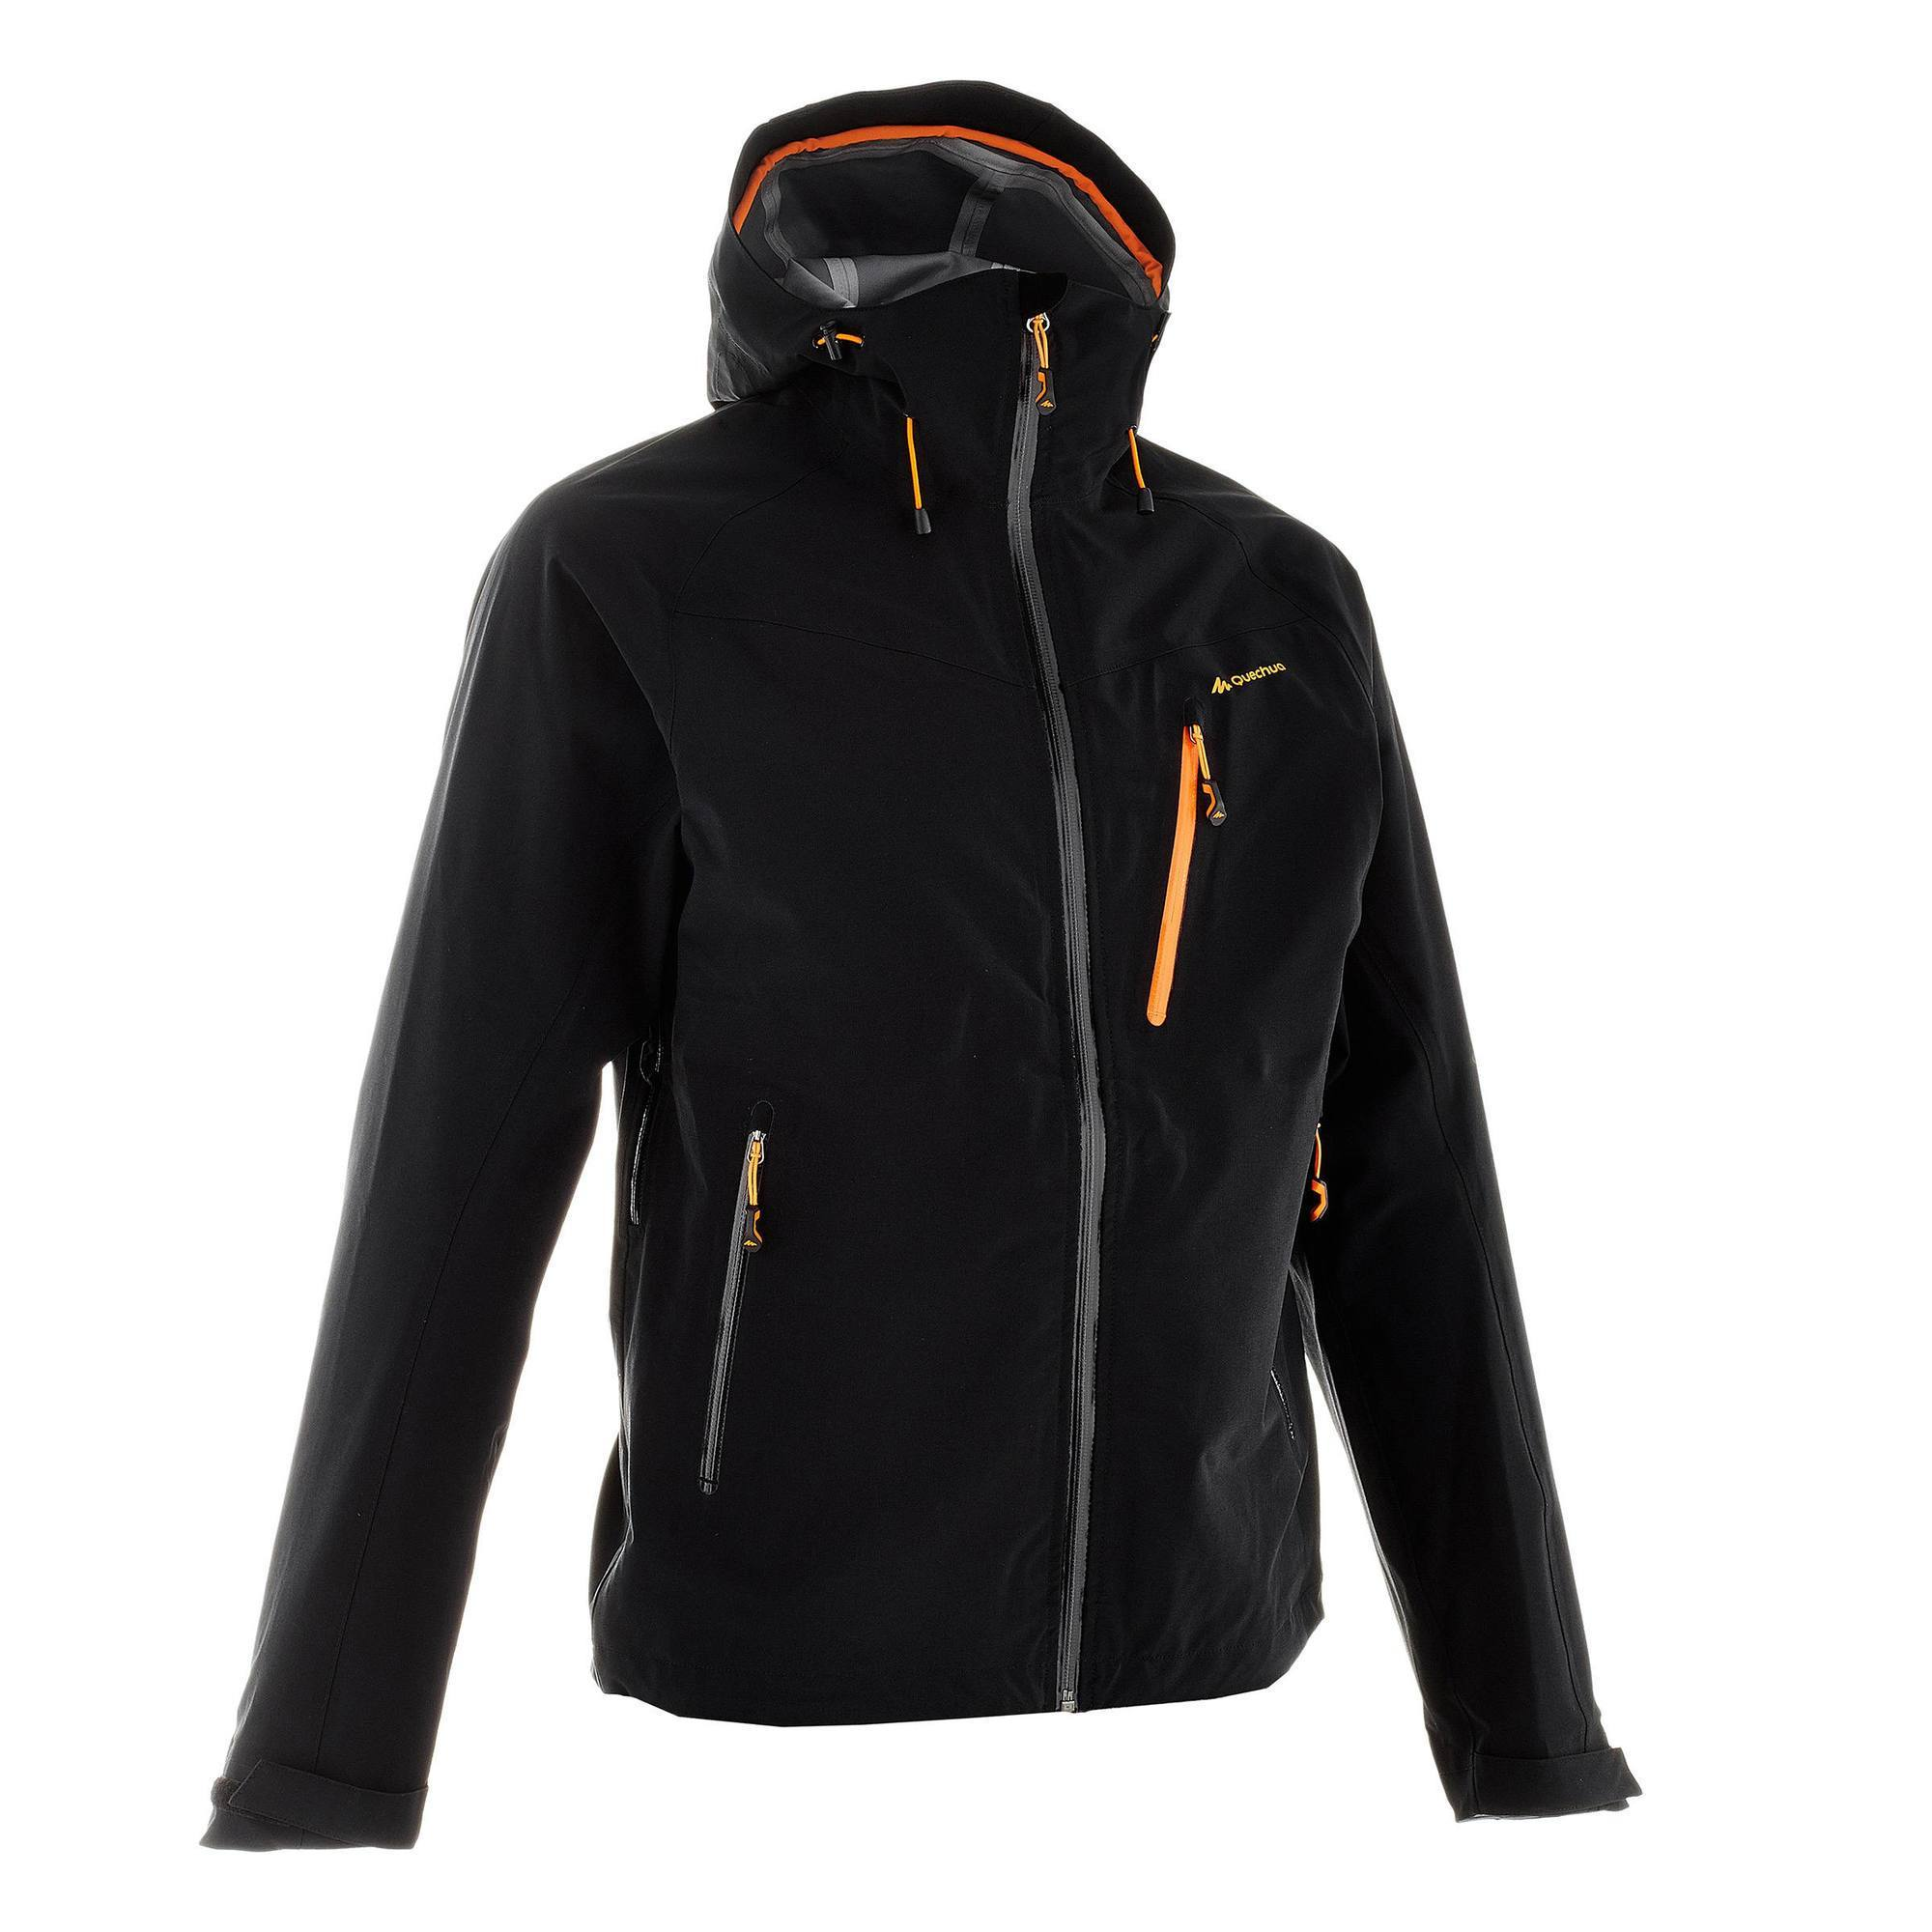 taglia 40 4cf1d aa761 Test giacca Quechua Decathlon Forclaz 400 nera uomo - Slow ...